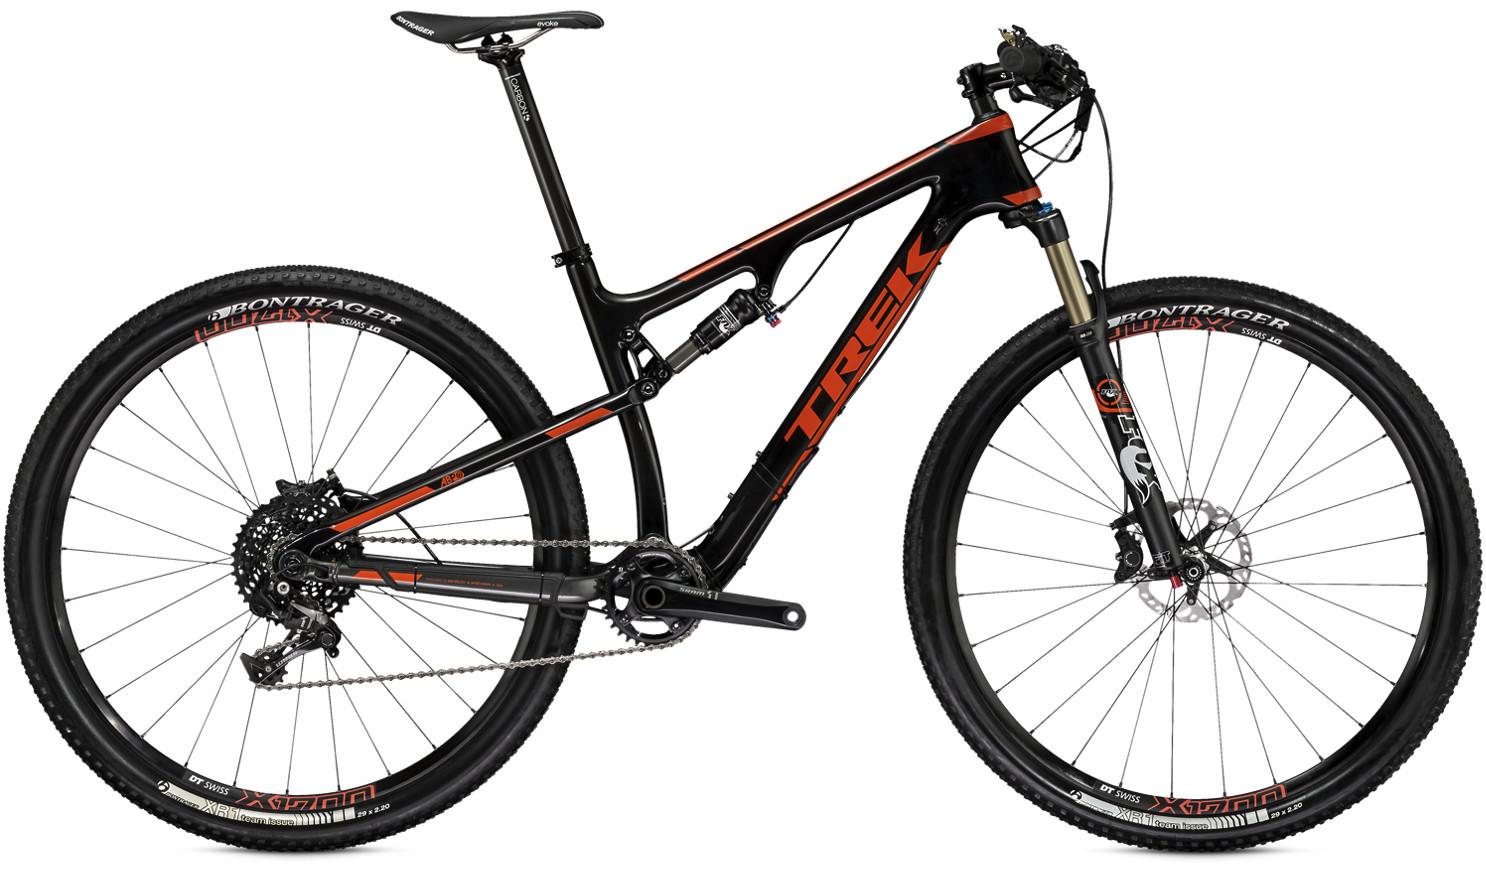 2015 Trek Superfly FS 9.8 SL - Reviews, Comparisons, Specs - Mountain Bikes - Vital MTB